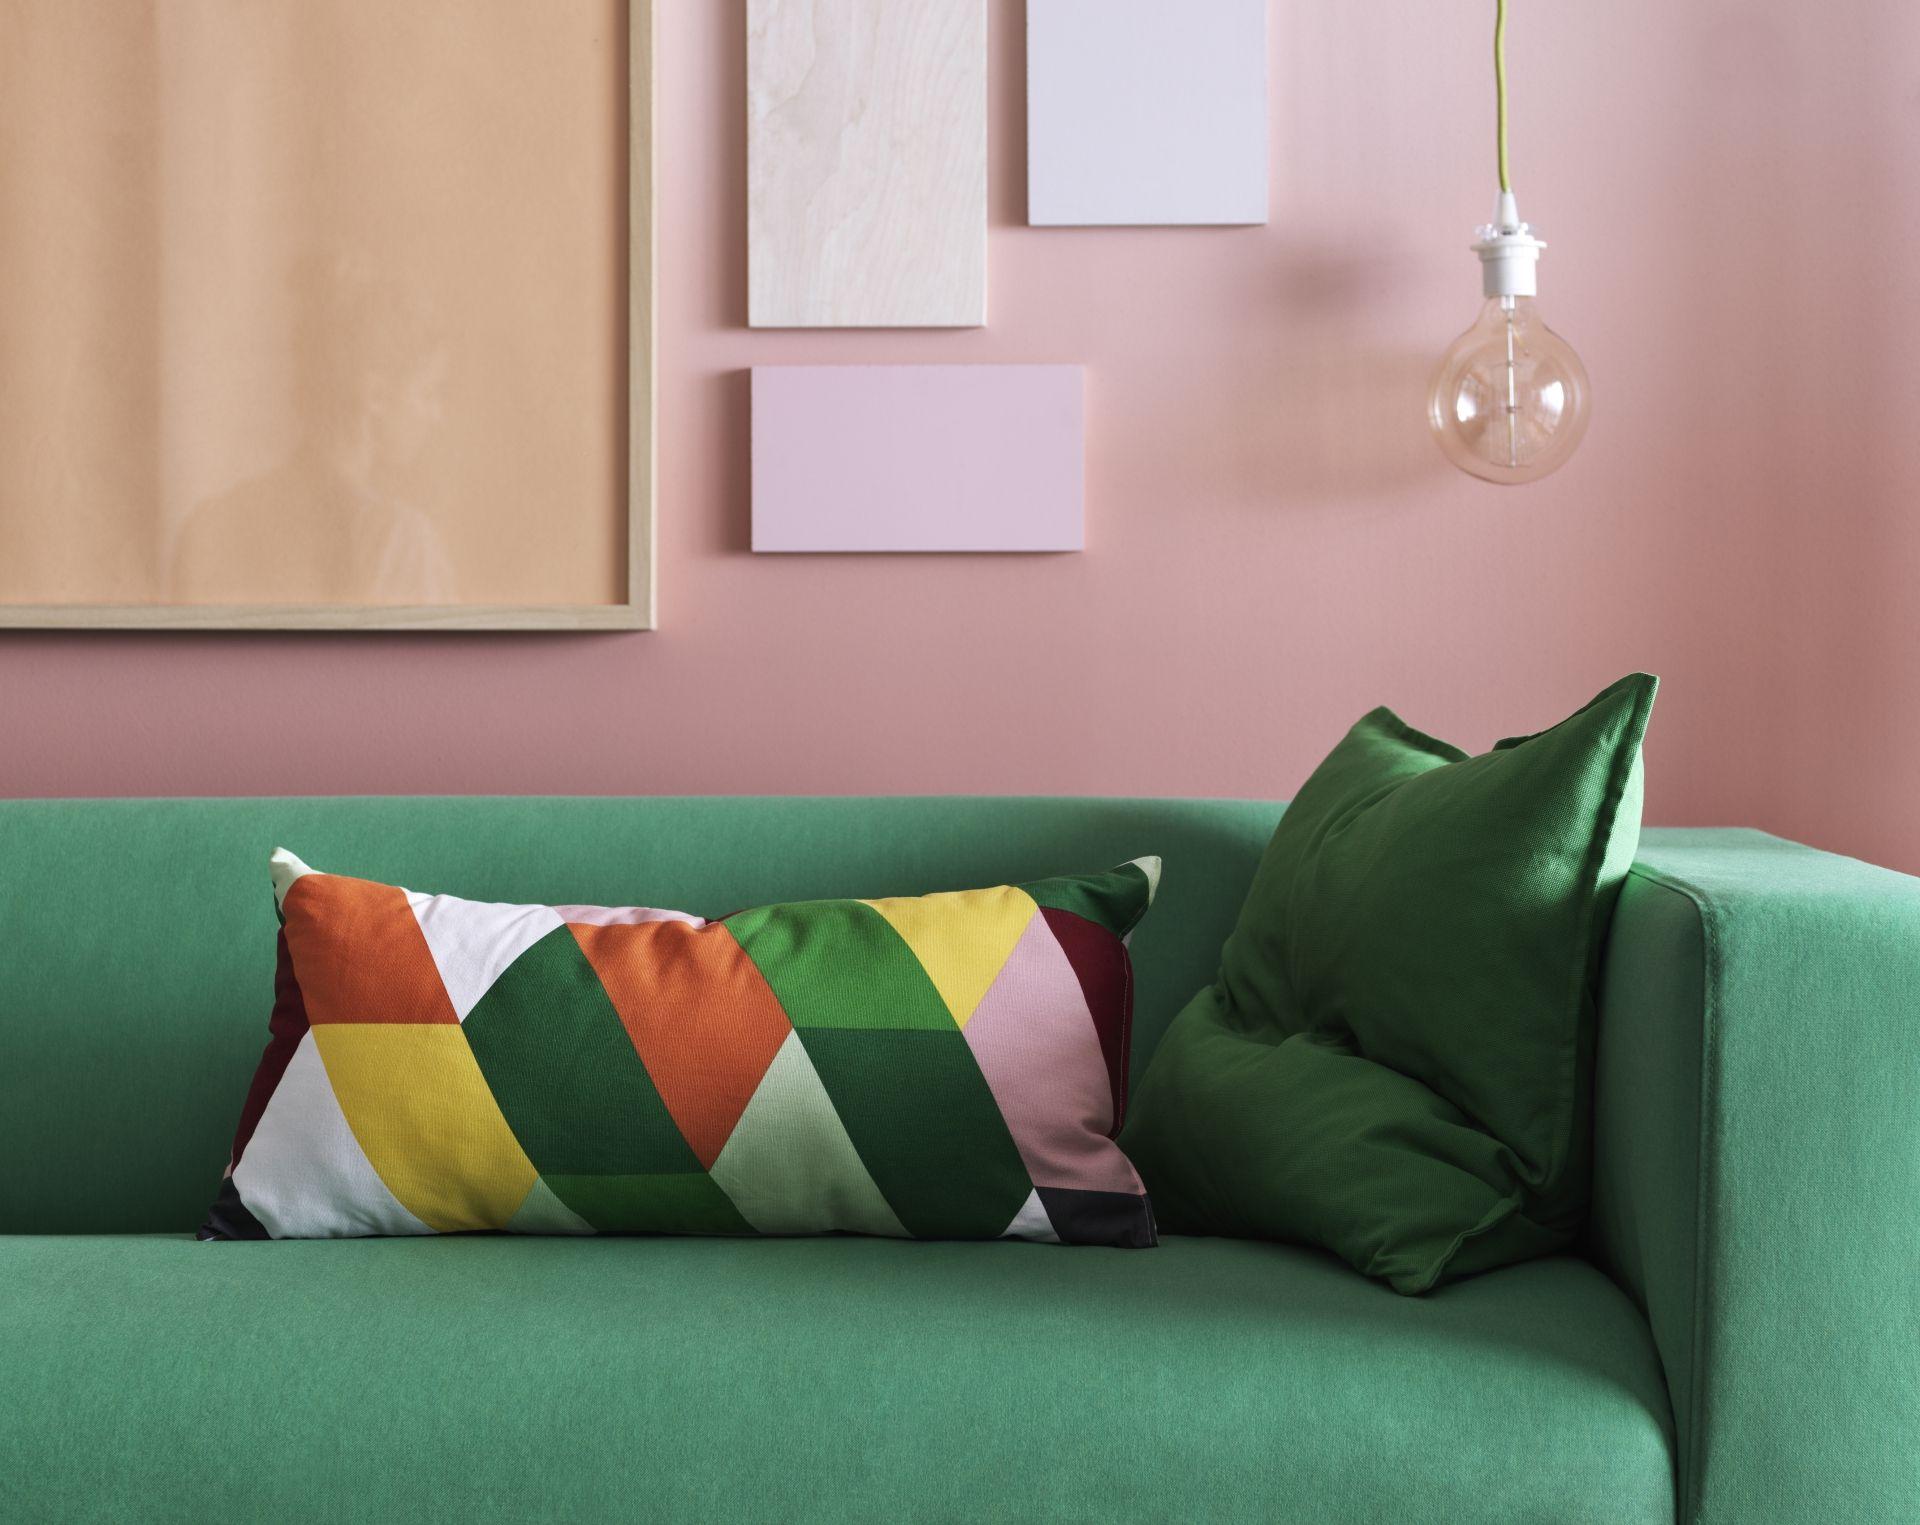 KLIPPAN bank   #IKEA #IKEAnl #zitbank #woonkamer #groen #fris #bank ...